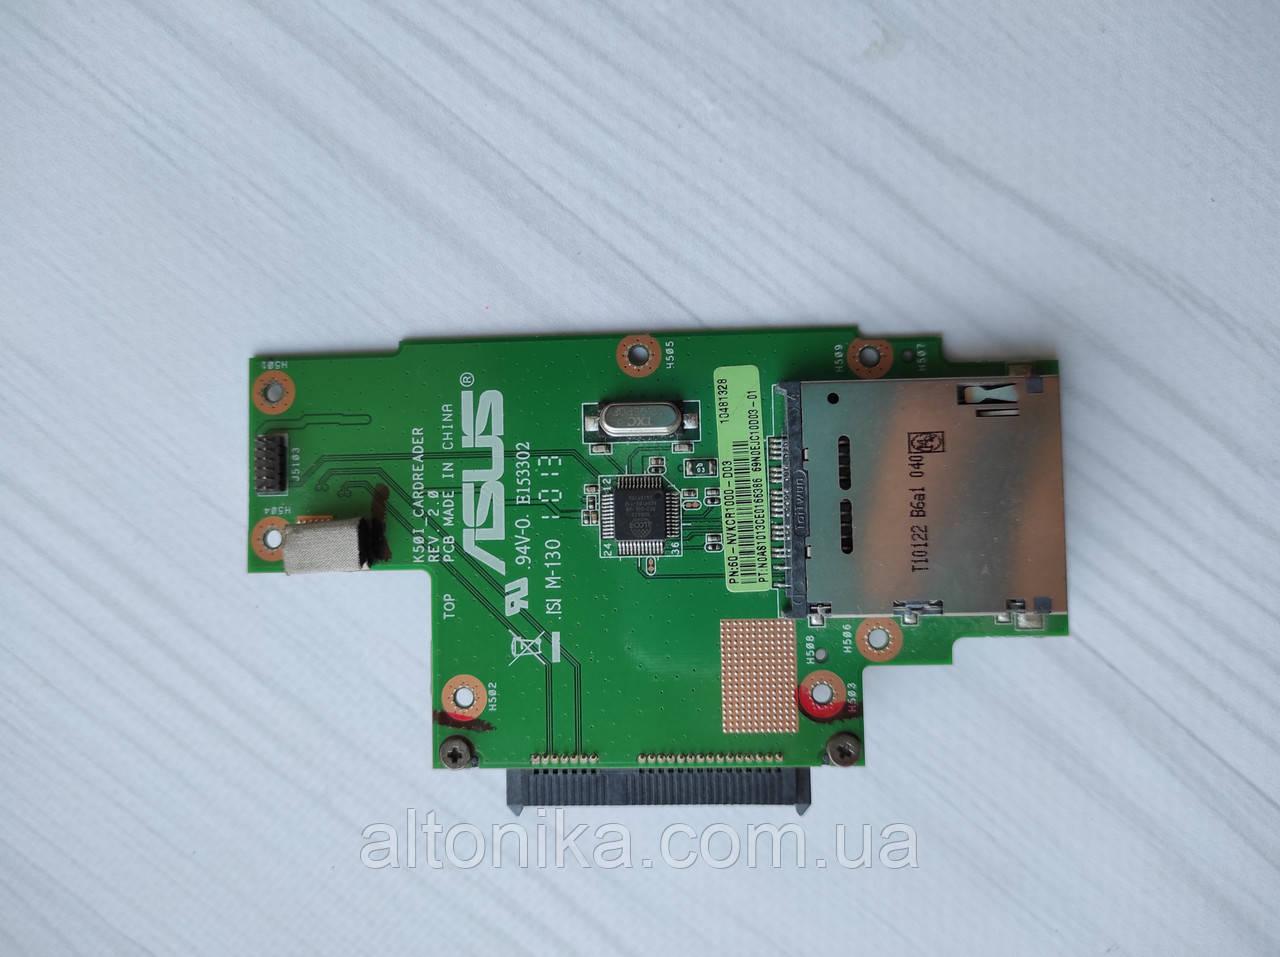 SATA, Card Reader плата расширения для ноутбука Asus K50 (K50I_CARDREADER REV:2.0) 60-NVKCR1000-D03